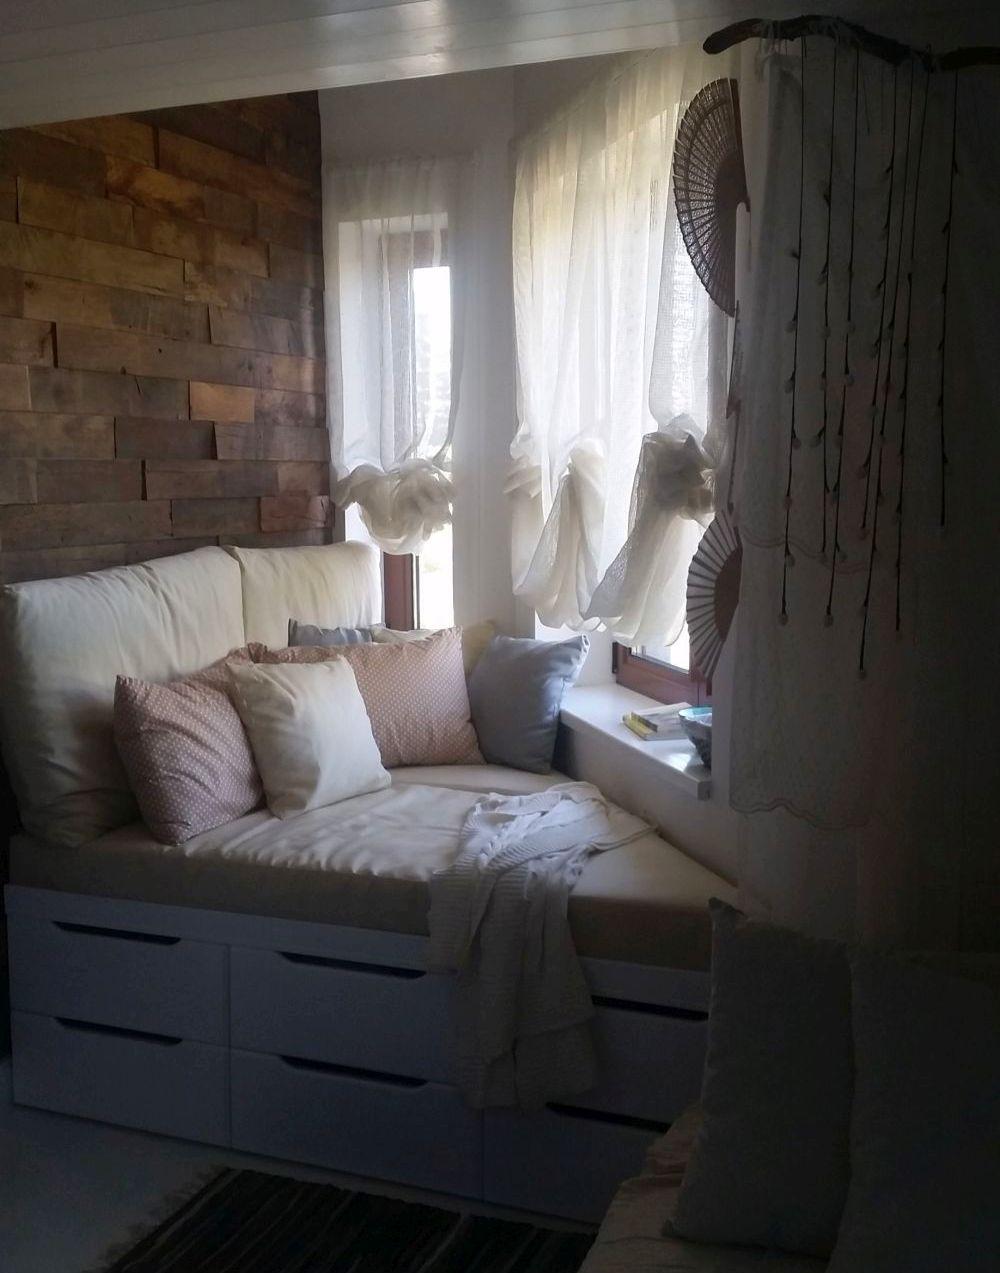 adelaparvu.com despre amenajare camera adolescenta Bucuresti, Romania, stil BoHo chic, Designer Adela Parvu, Foto Adela Parvu (18)